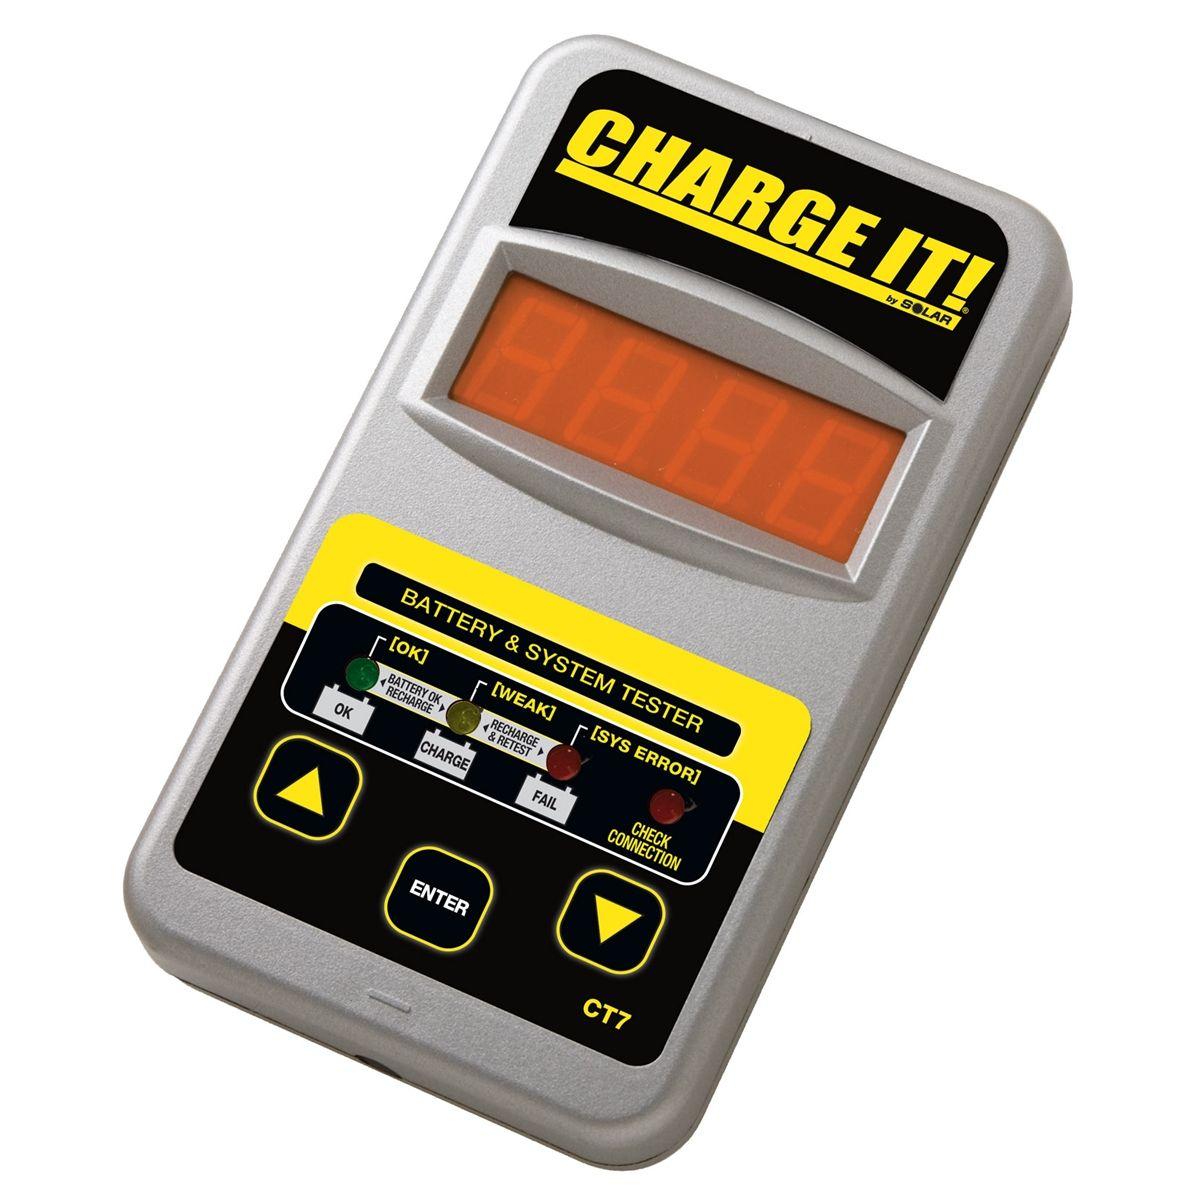 12 Volt Battery Tester Review : Solar v digital battery and system tester ct